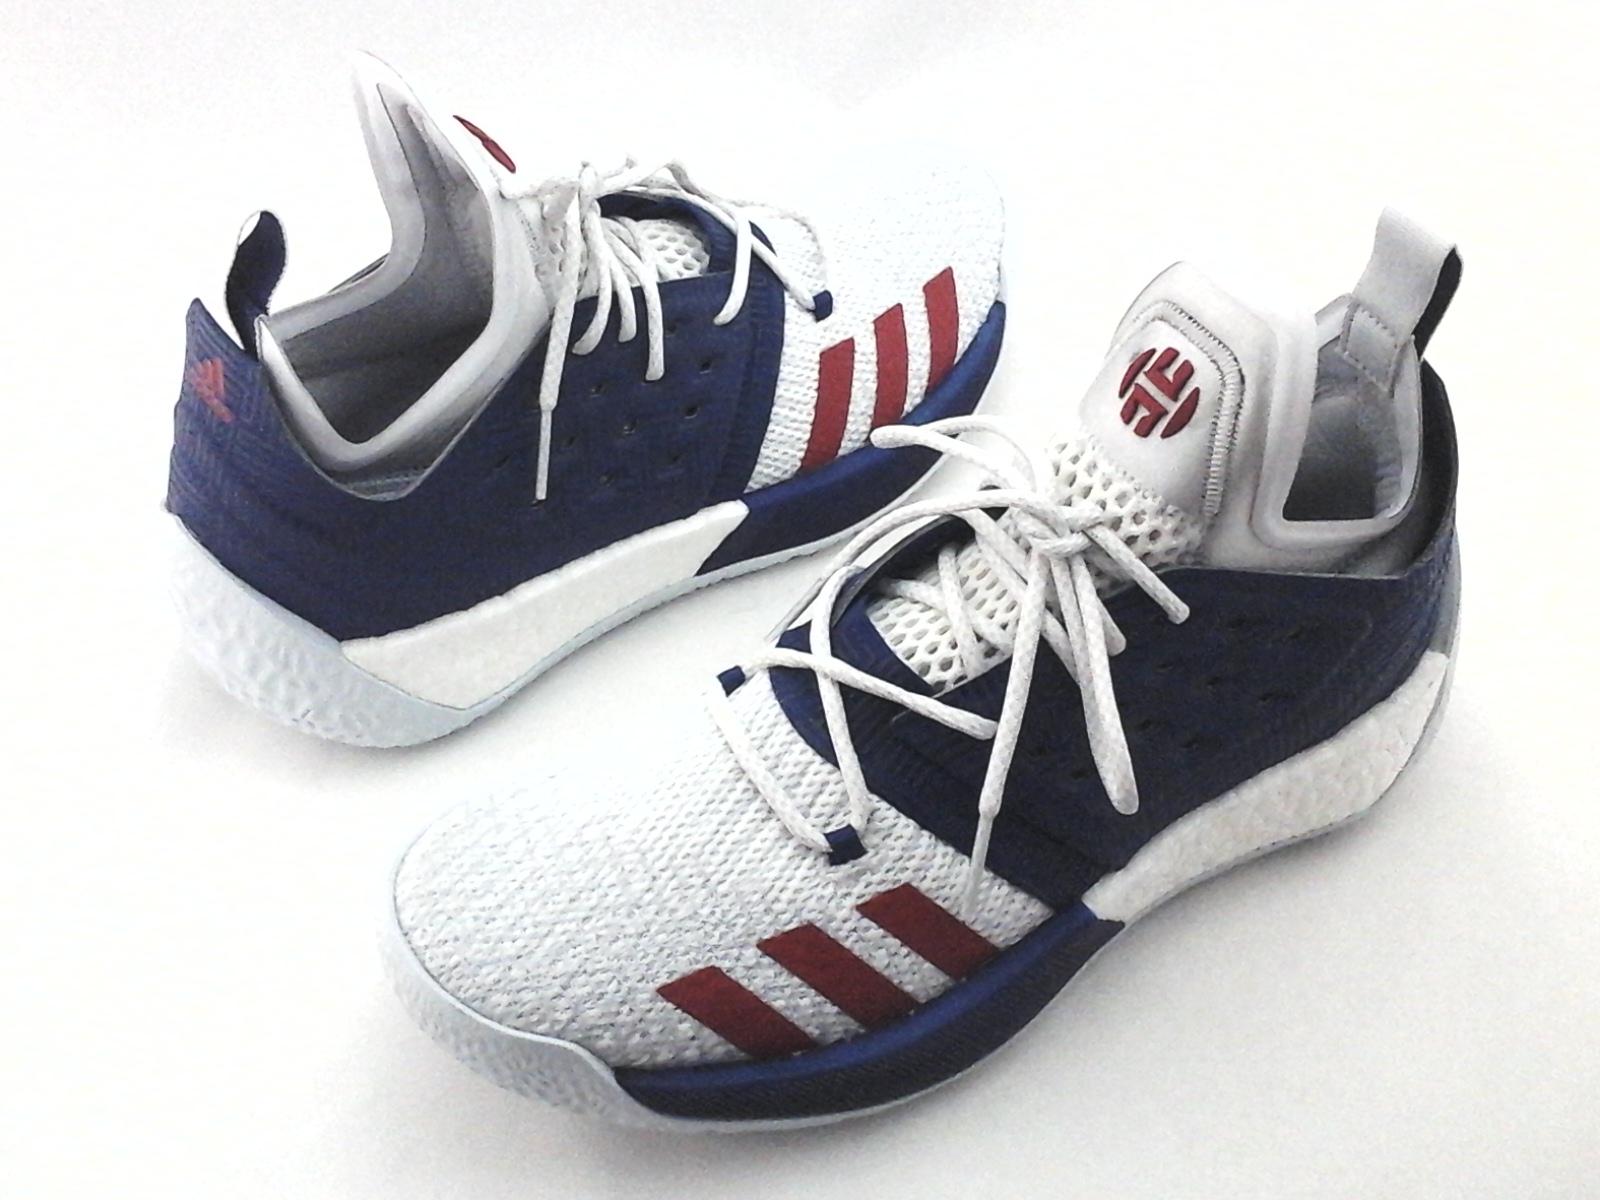 premium selection f4e37 900cd Adidas J. HARDEN Boost Vol. 2 Basketball Shoes AQ0026 Mens US 10.544 23  New